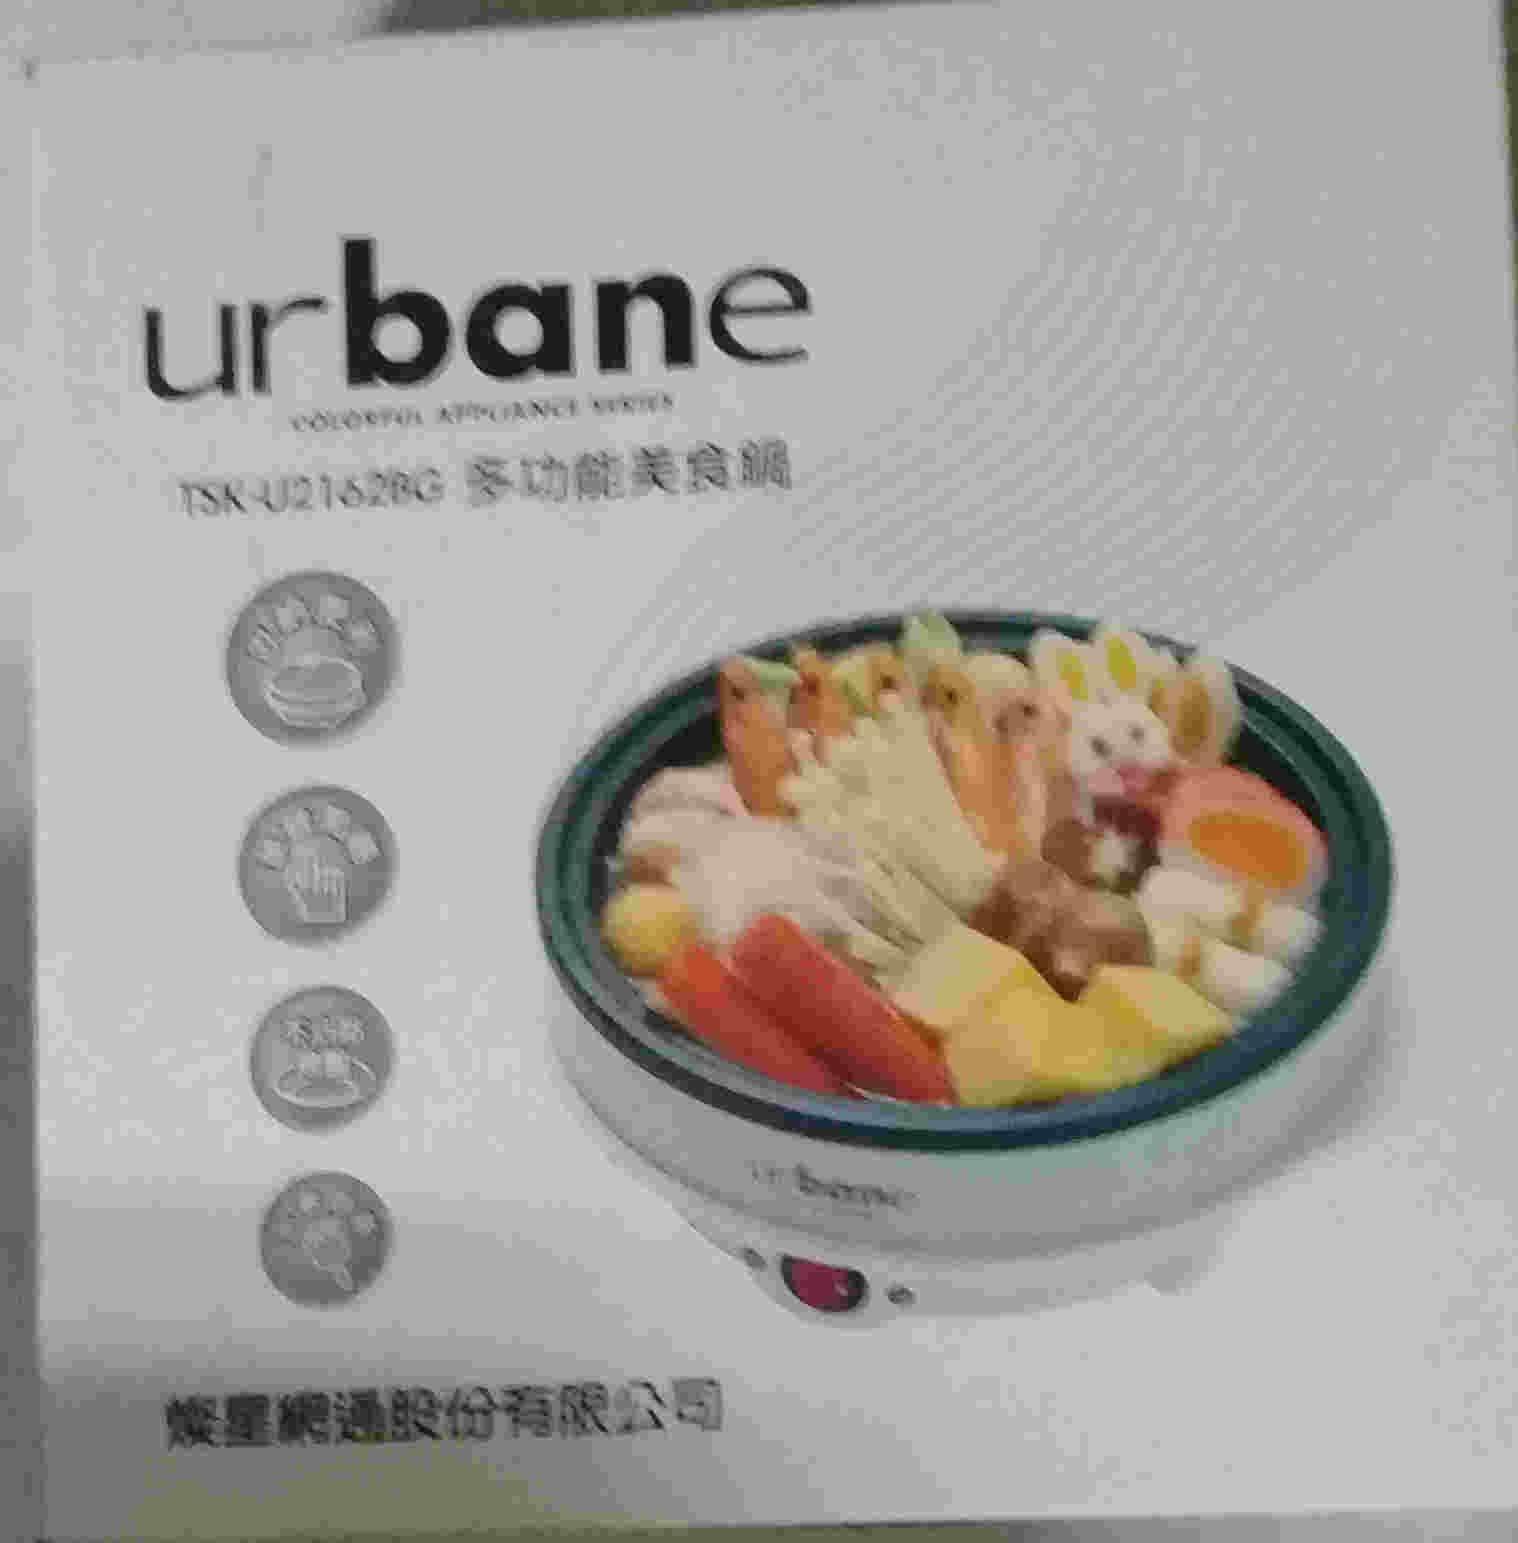 UR bane 電火鍋